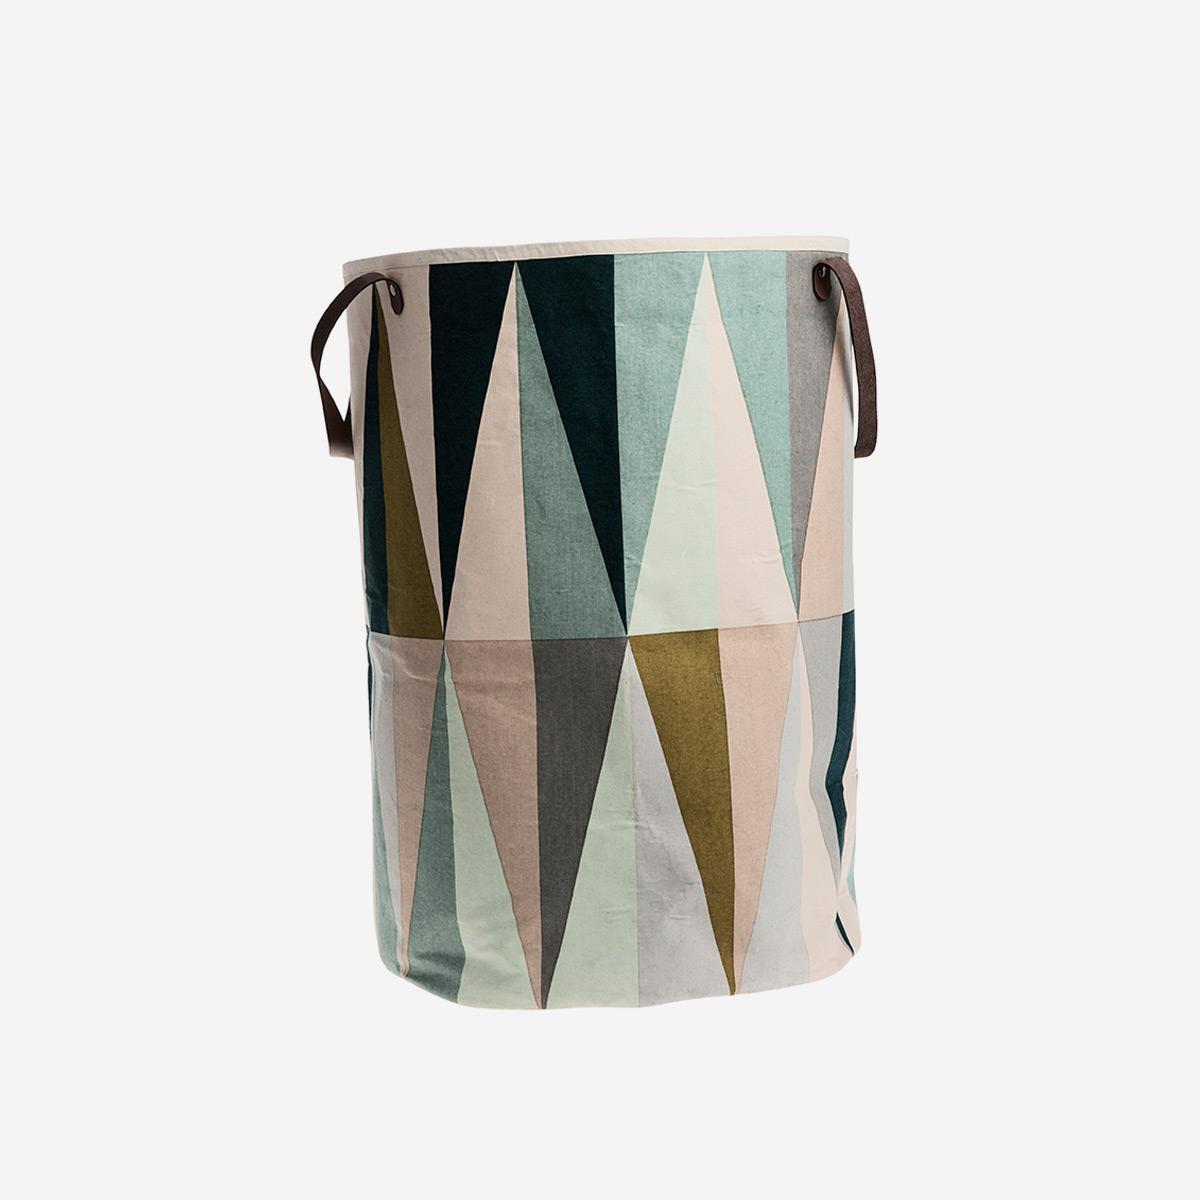 rikiki grafik produkt w schekorb spear. Black Bedroom Furniture Sets. Home Design Ideas